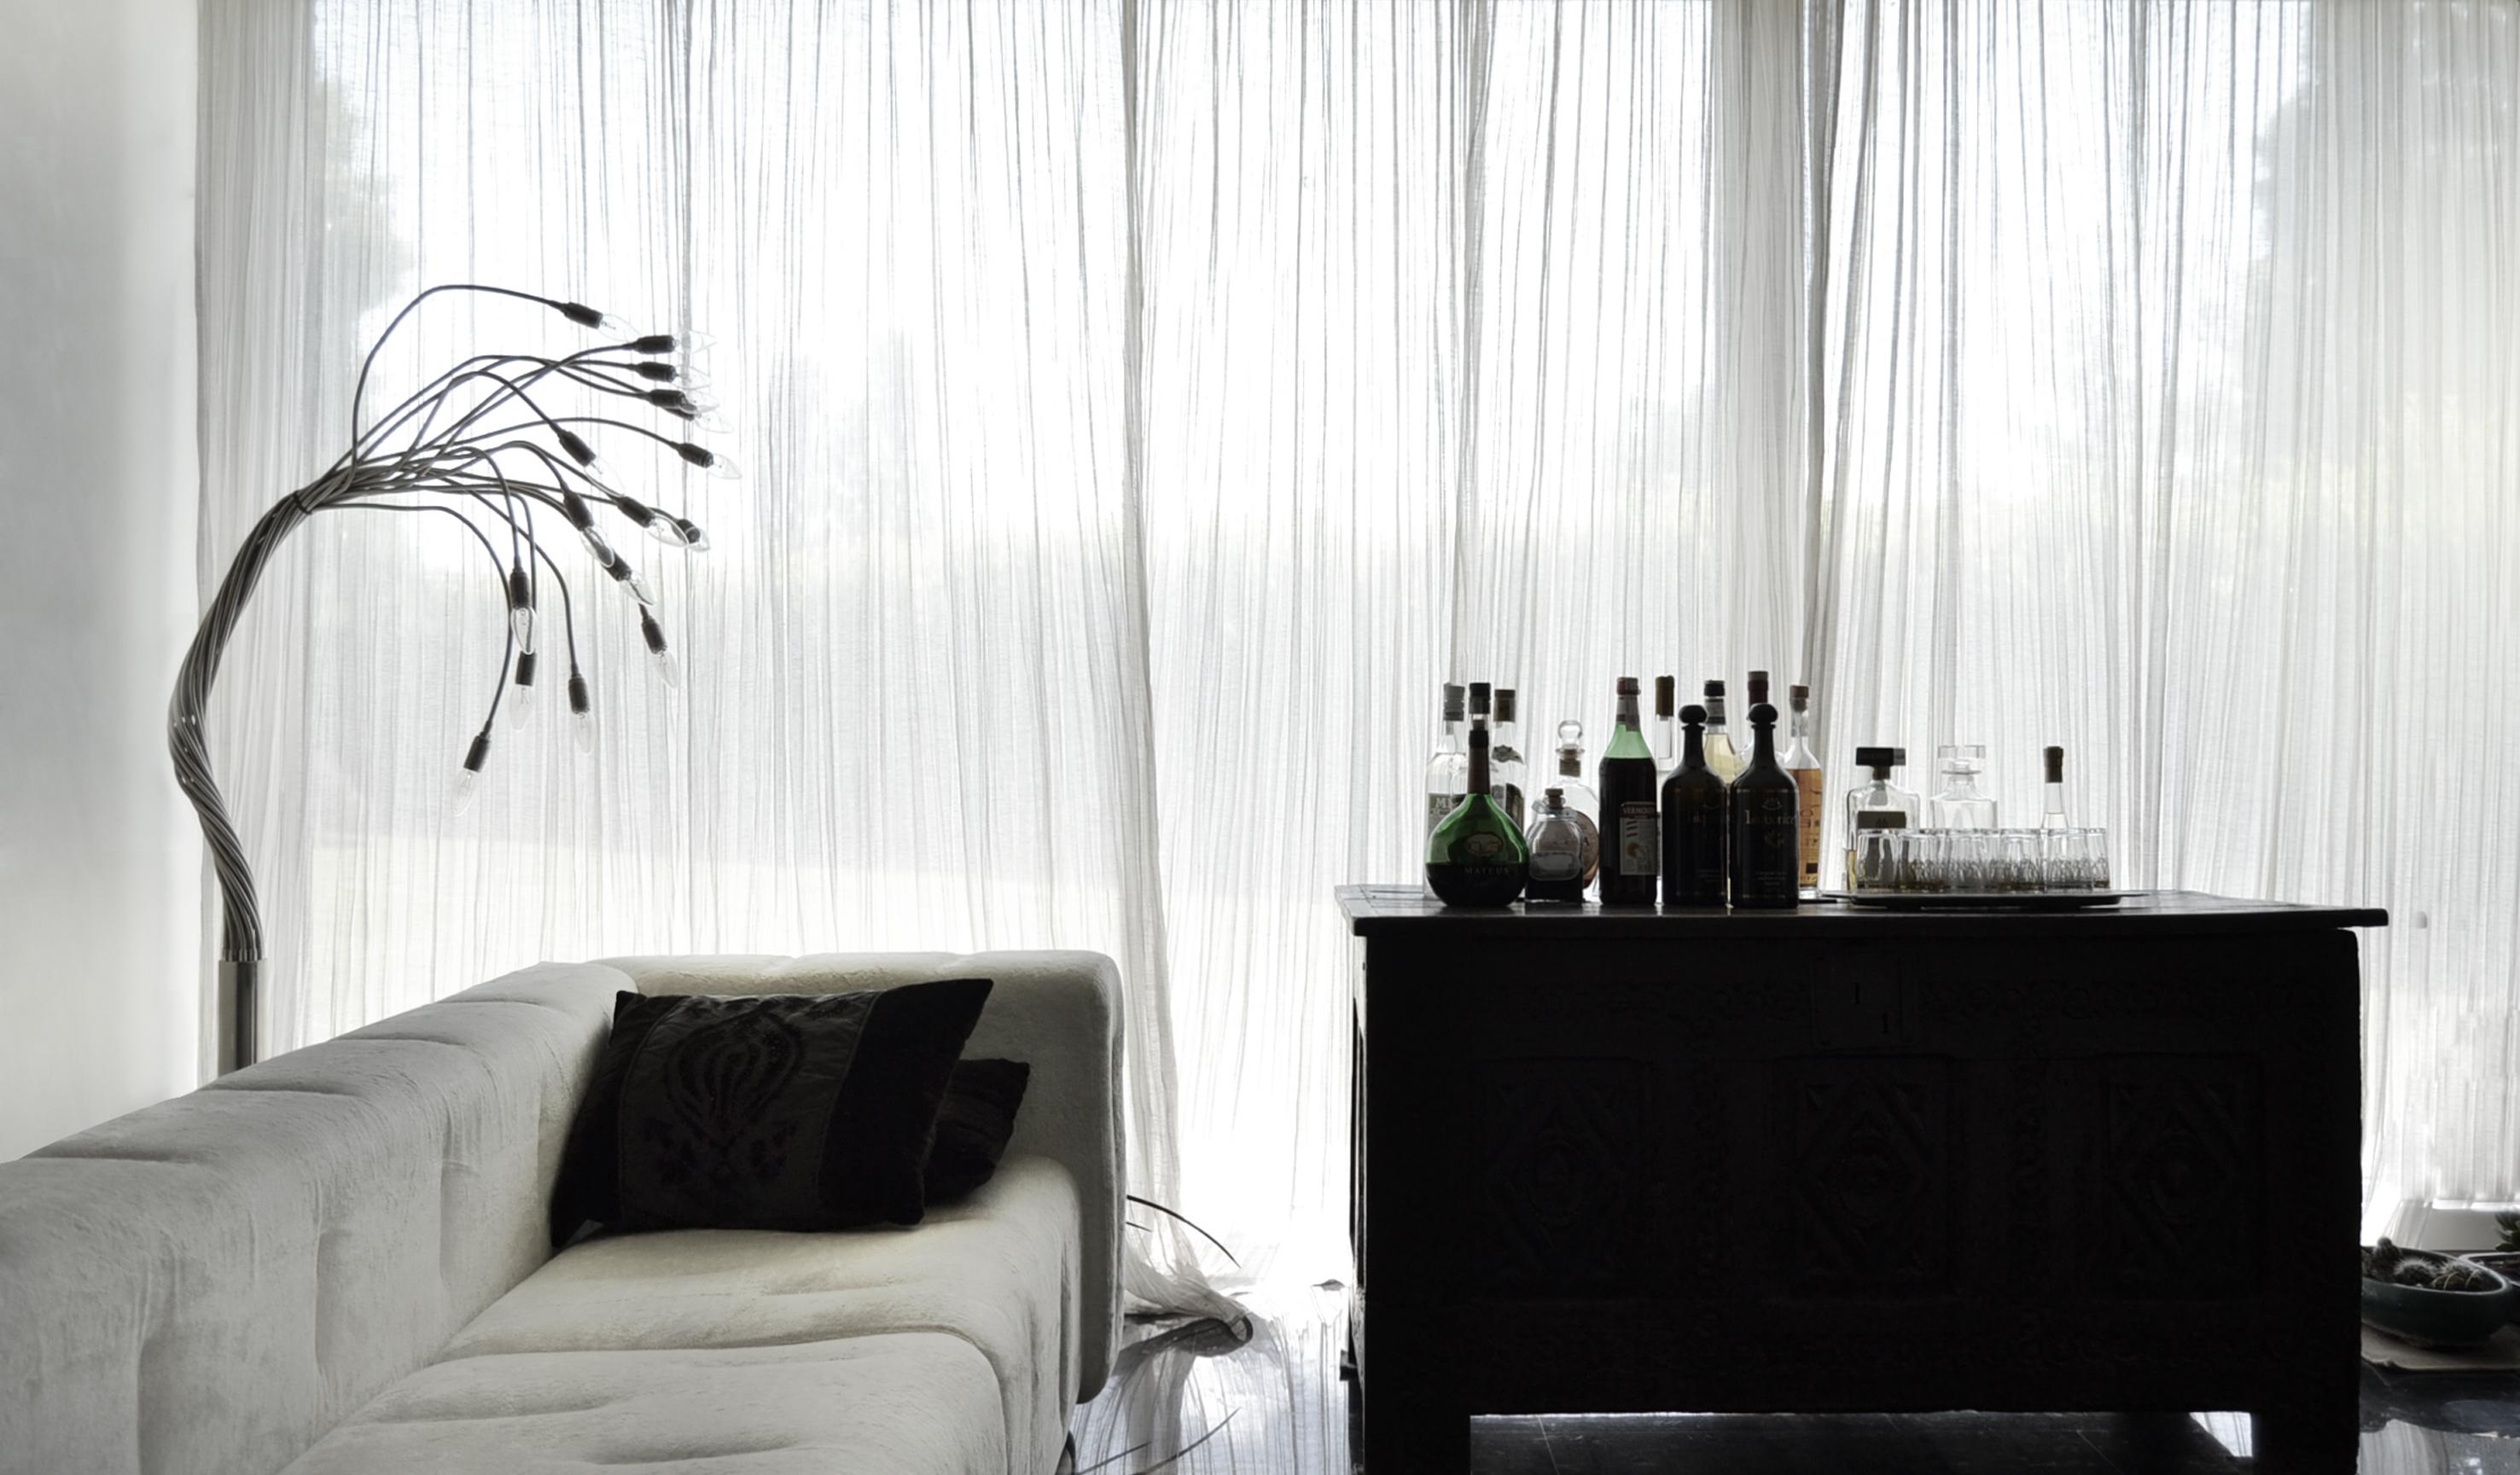 Meeting Relax Room - Catellani lights